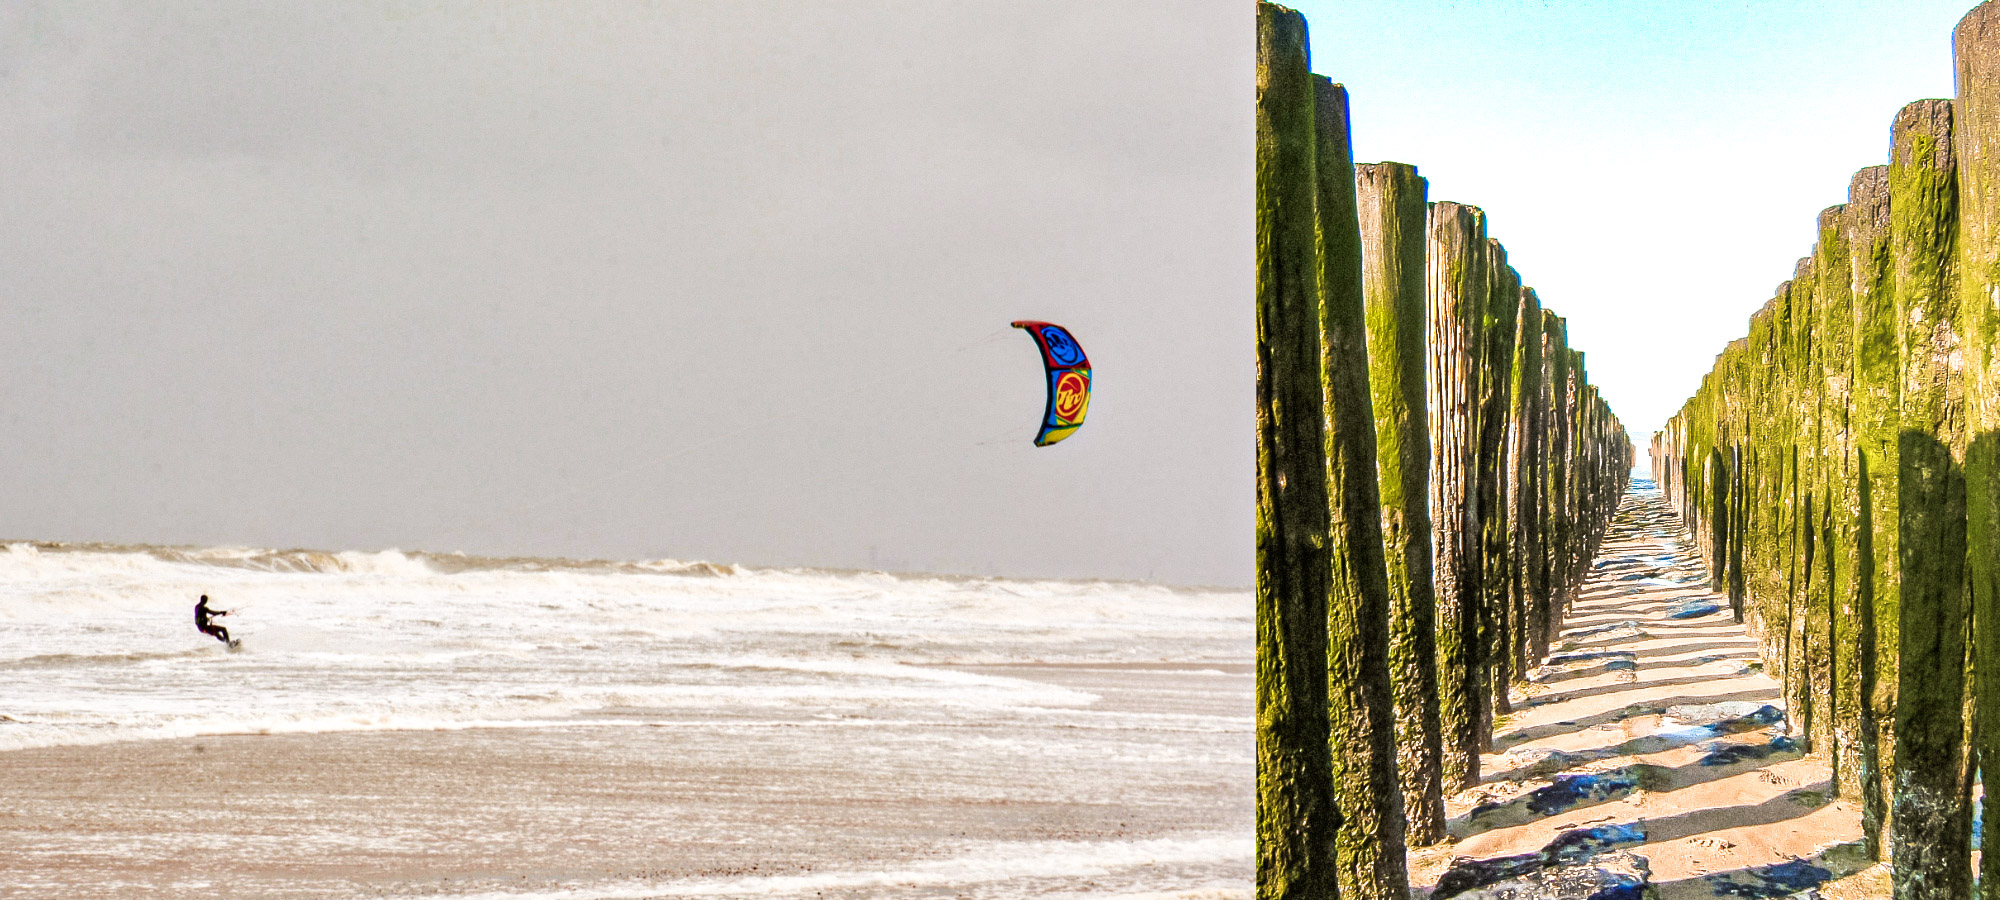 A man kite surfing on the waves in Knokke Heist